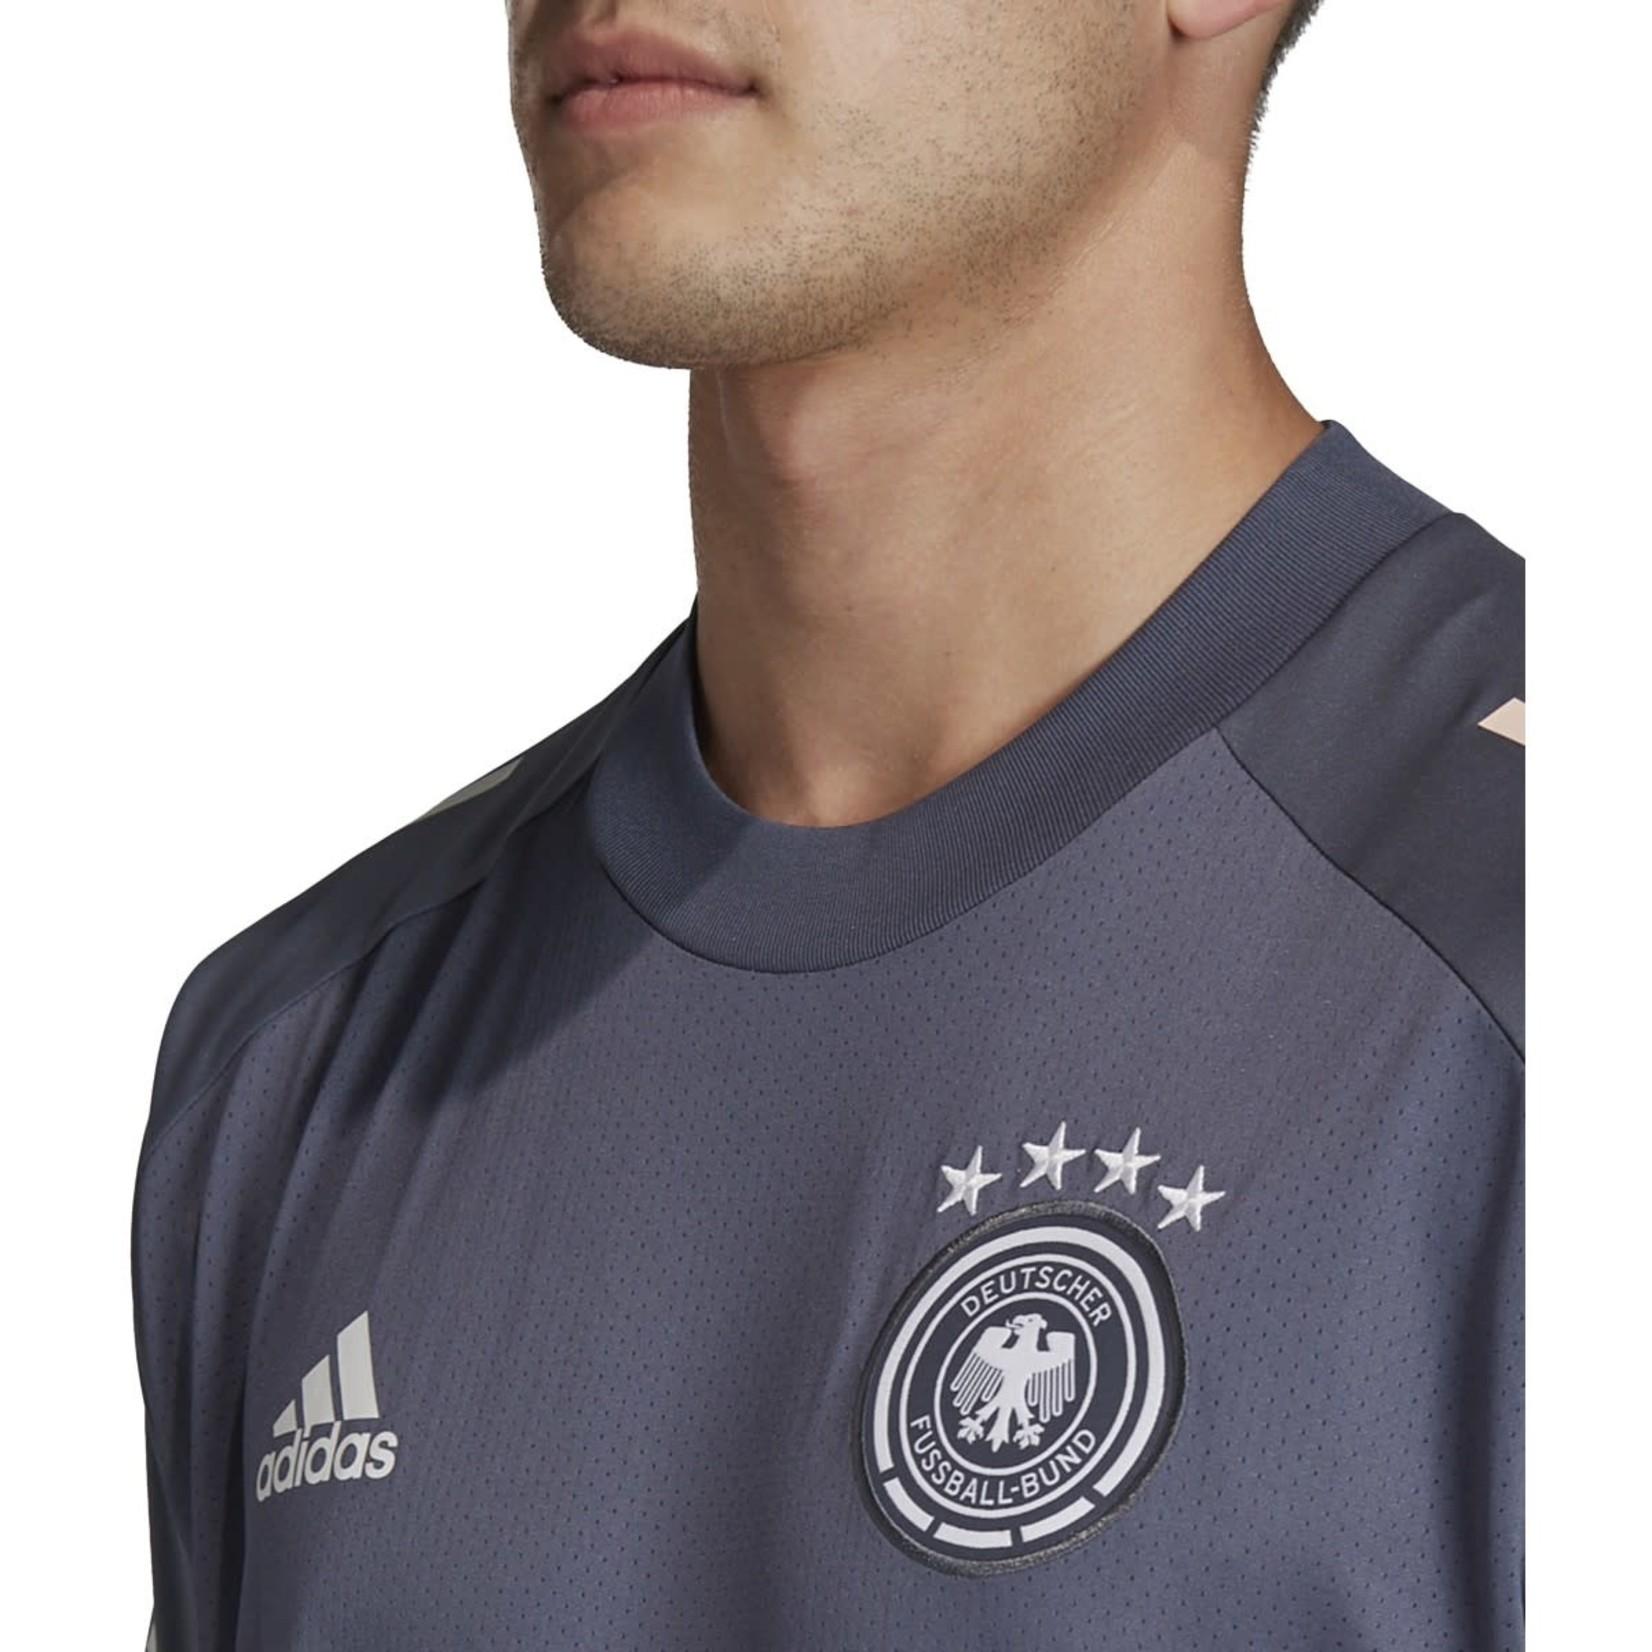 ADIDAS GERMANY 2020 TRAINING JERSEY